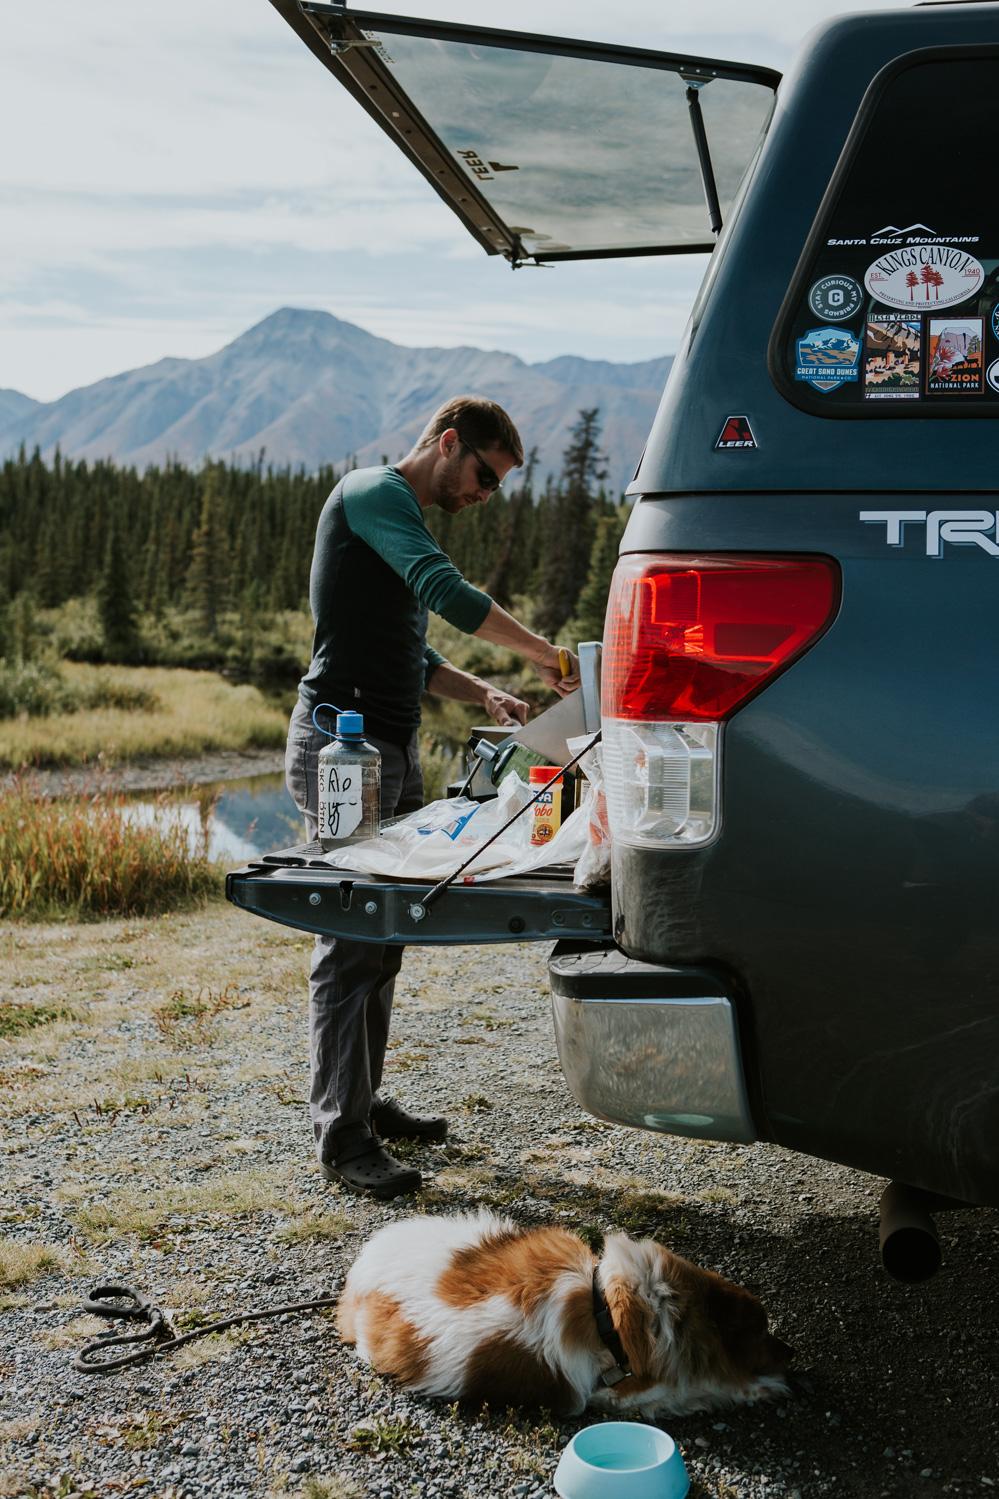 CindyGiovagnoli_BritishColumbia_Yukon_Alaska_roadtrip_AlCan_Alaskan_Highway_truck_camping-029.jpg